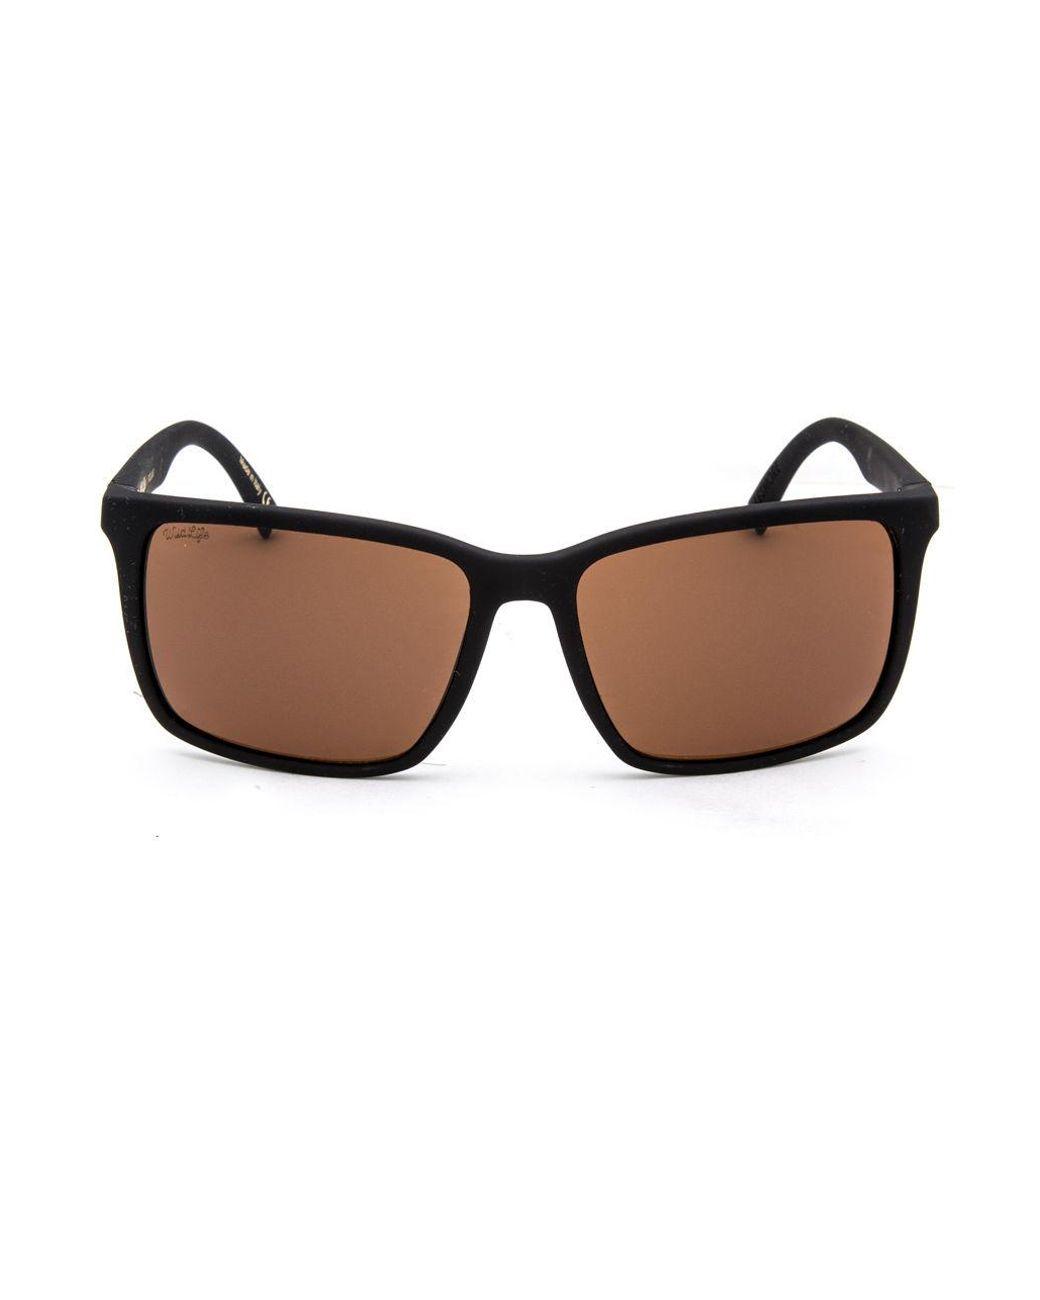 78206b5b0e Von Zipper Lesmore Wildlife Black Soft Satin   Bronze Polarized Sunglasses  in Black for Men - Lyst